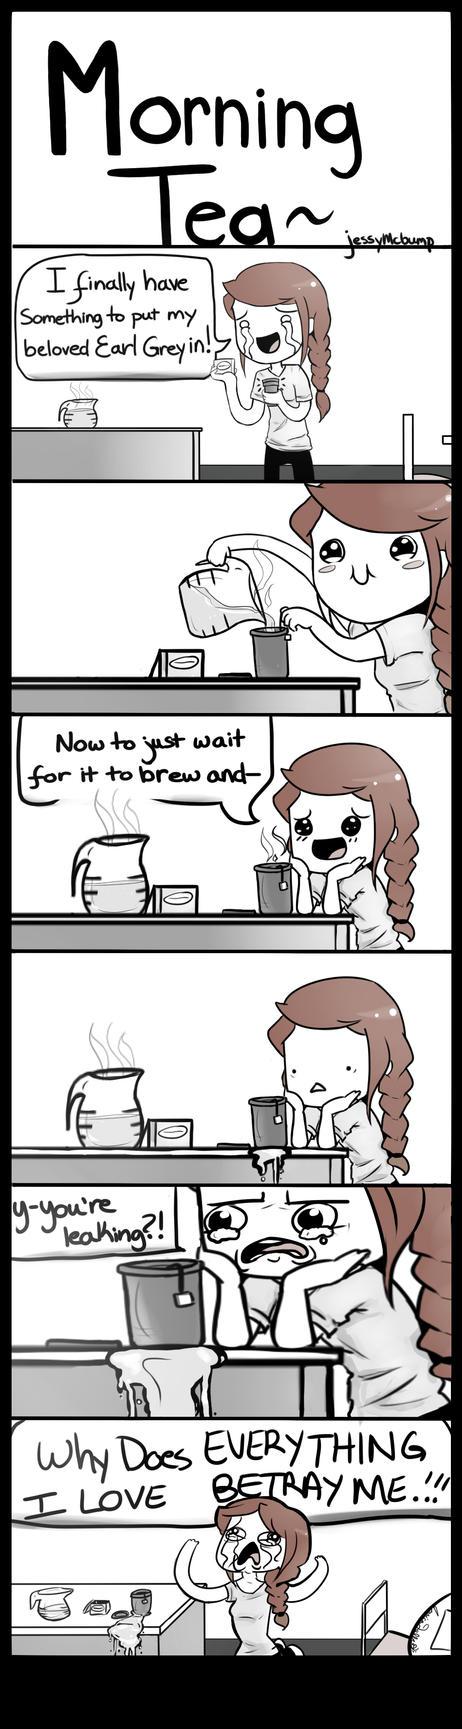 Morning Tea by JessyMcBump